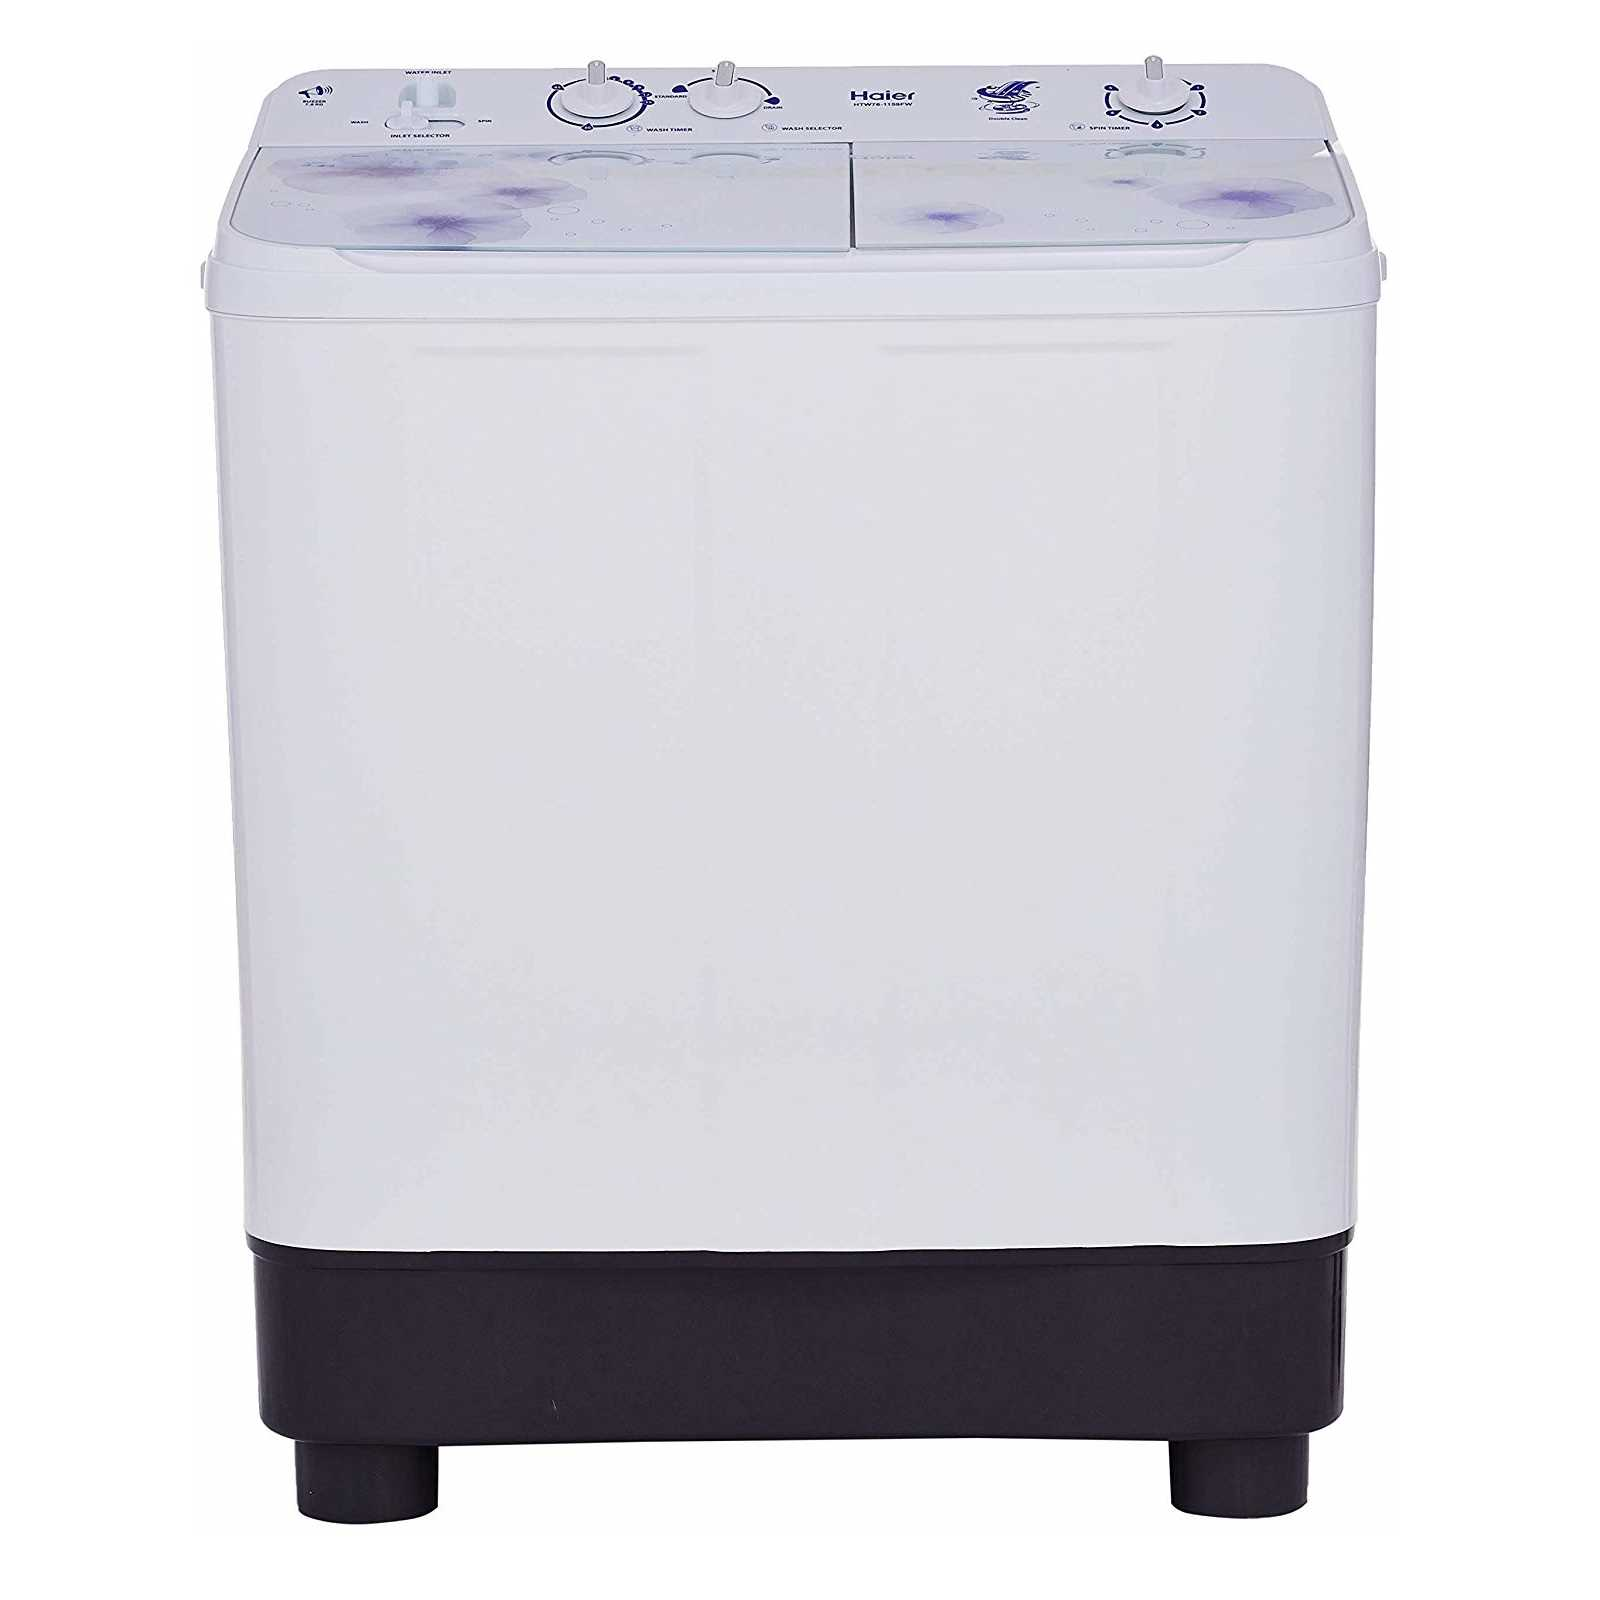 Haier HTW76-1159 7.6 Kg Semi Automatic Top Loading Washing Machine